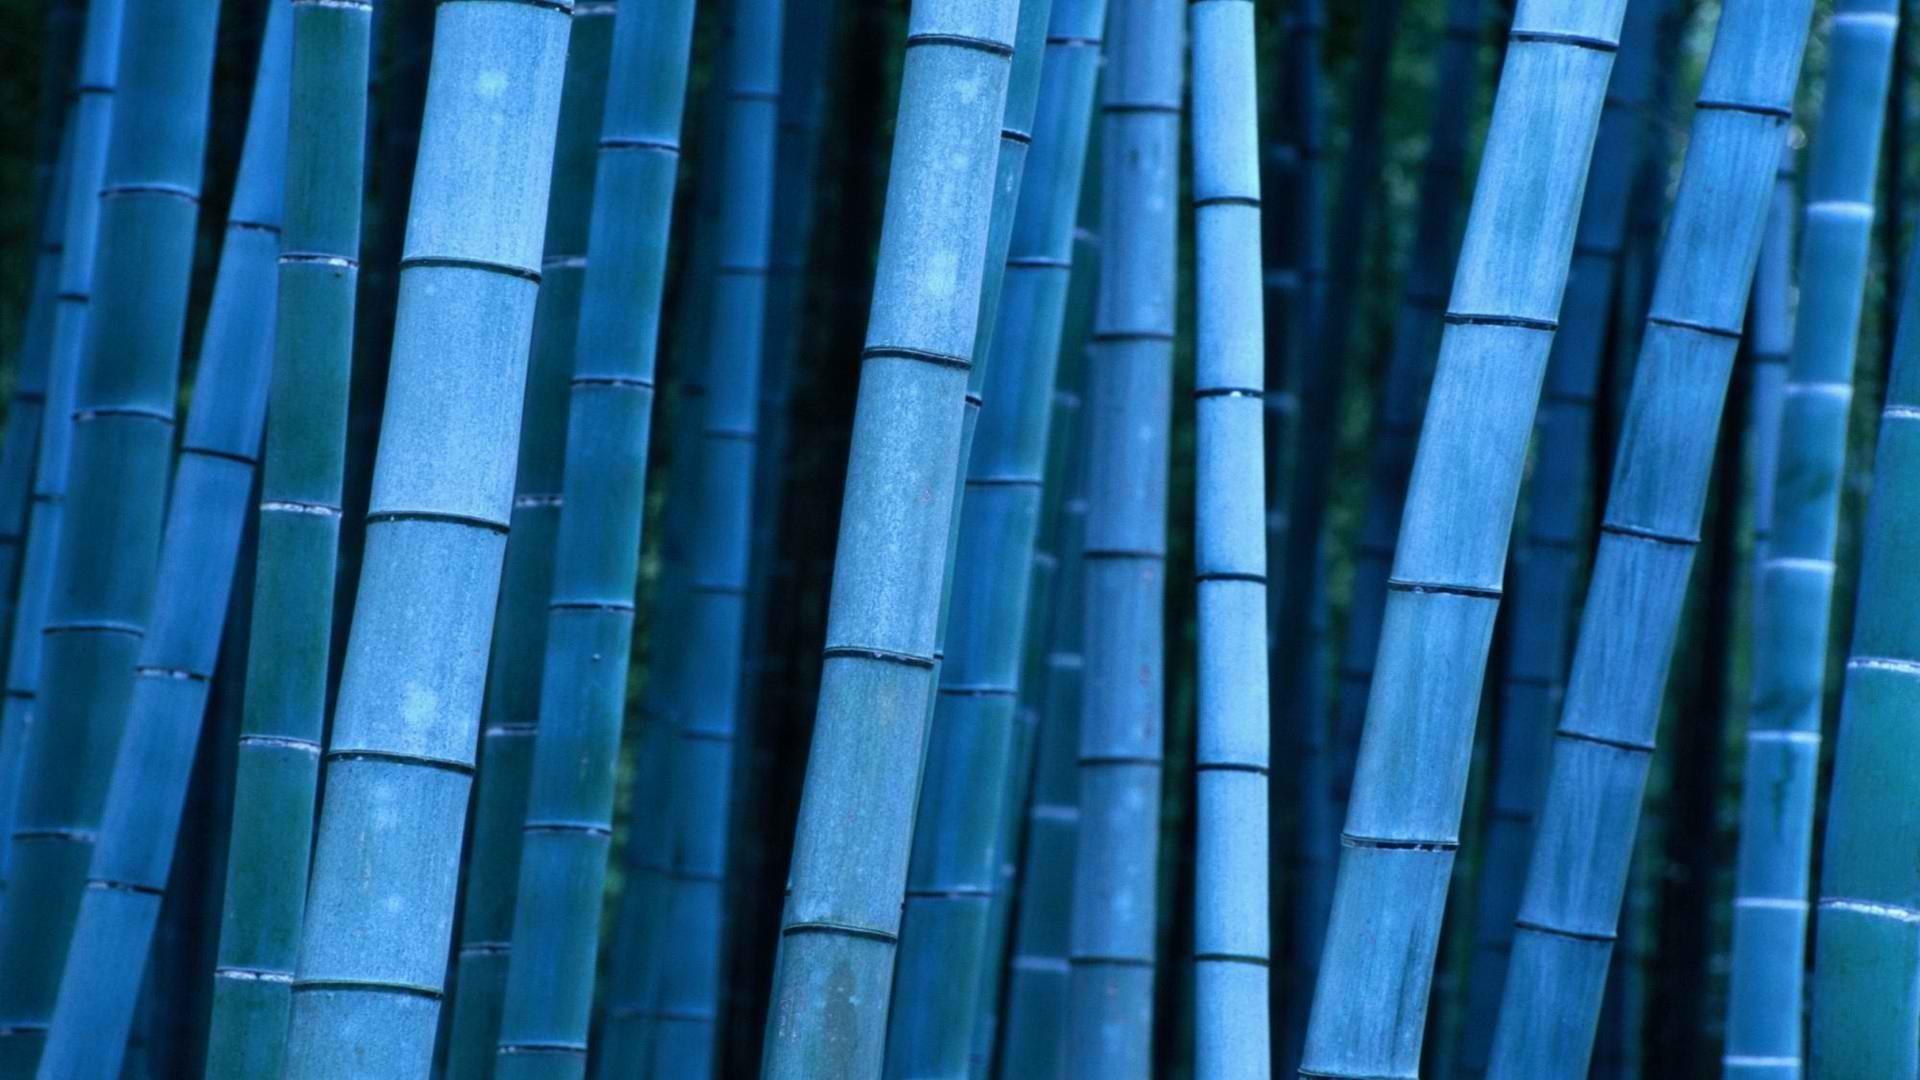 Wood-Bamboo-Wallpaper-HD